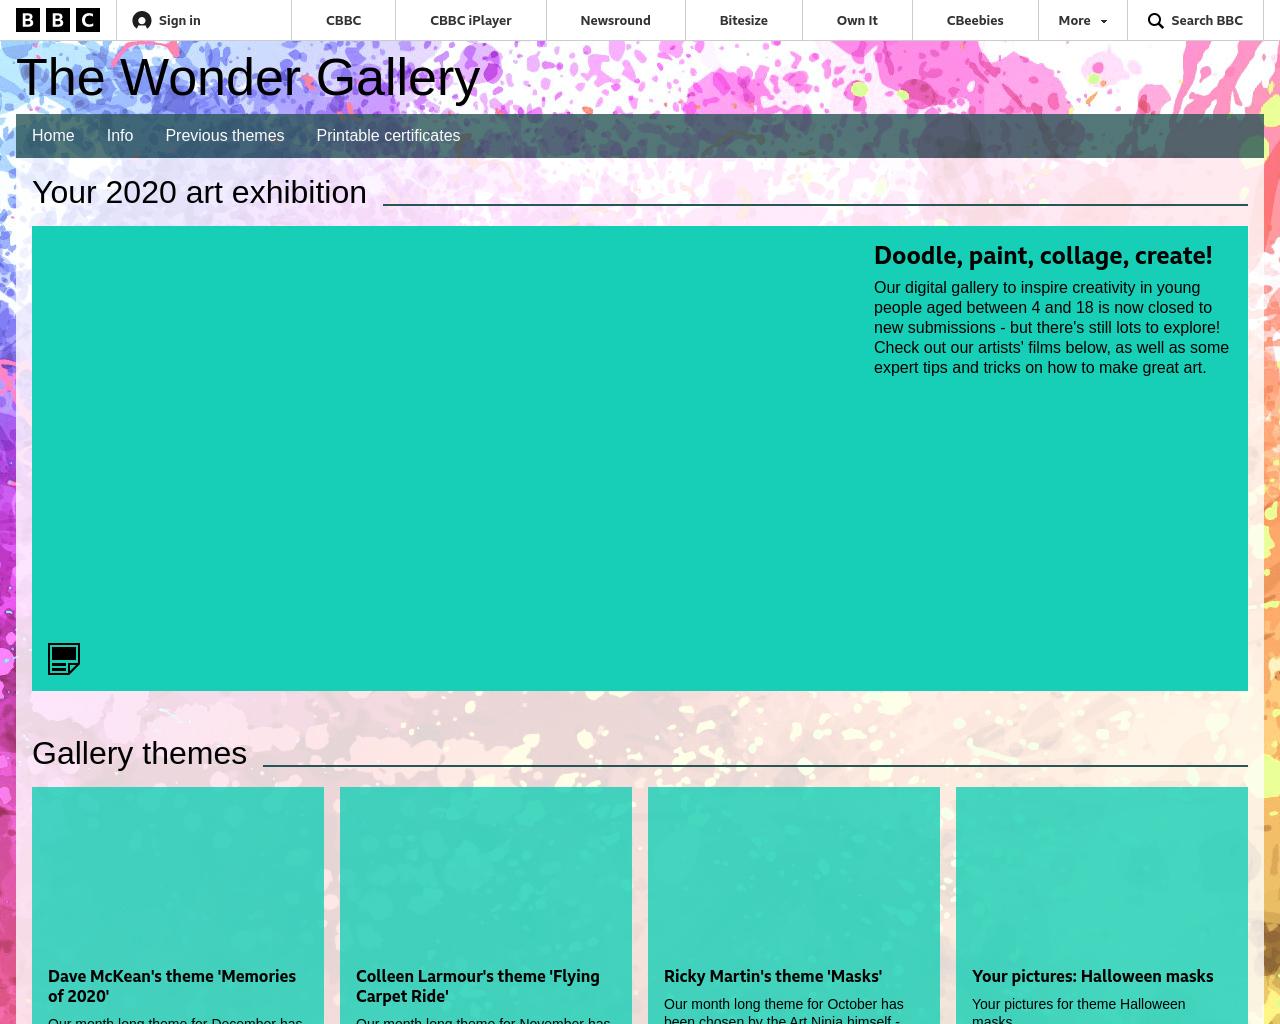 BBC NI Wonder Gallery